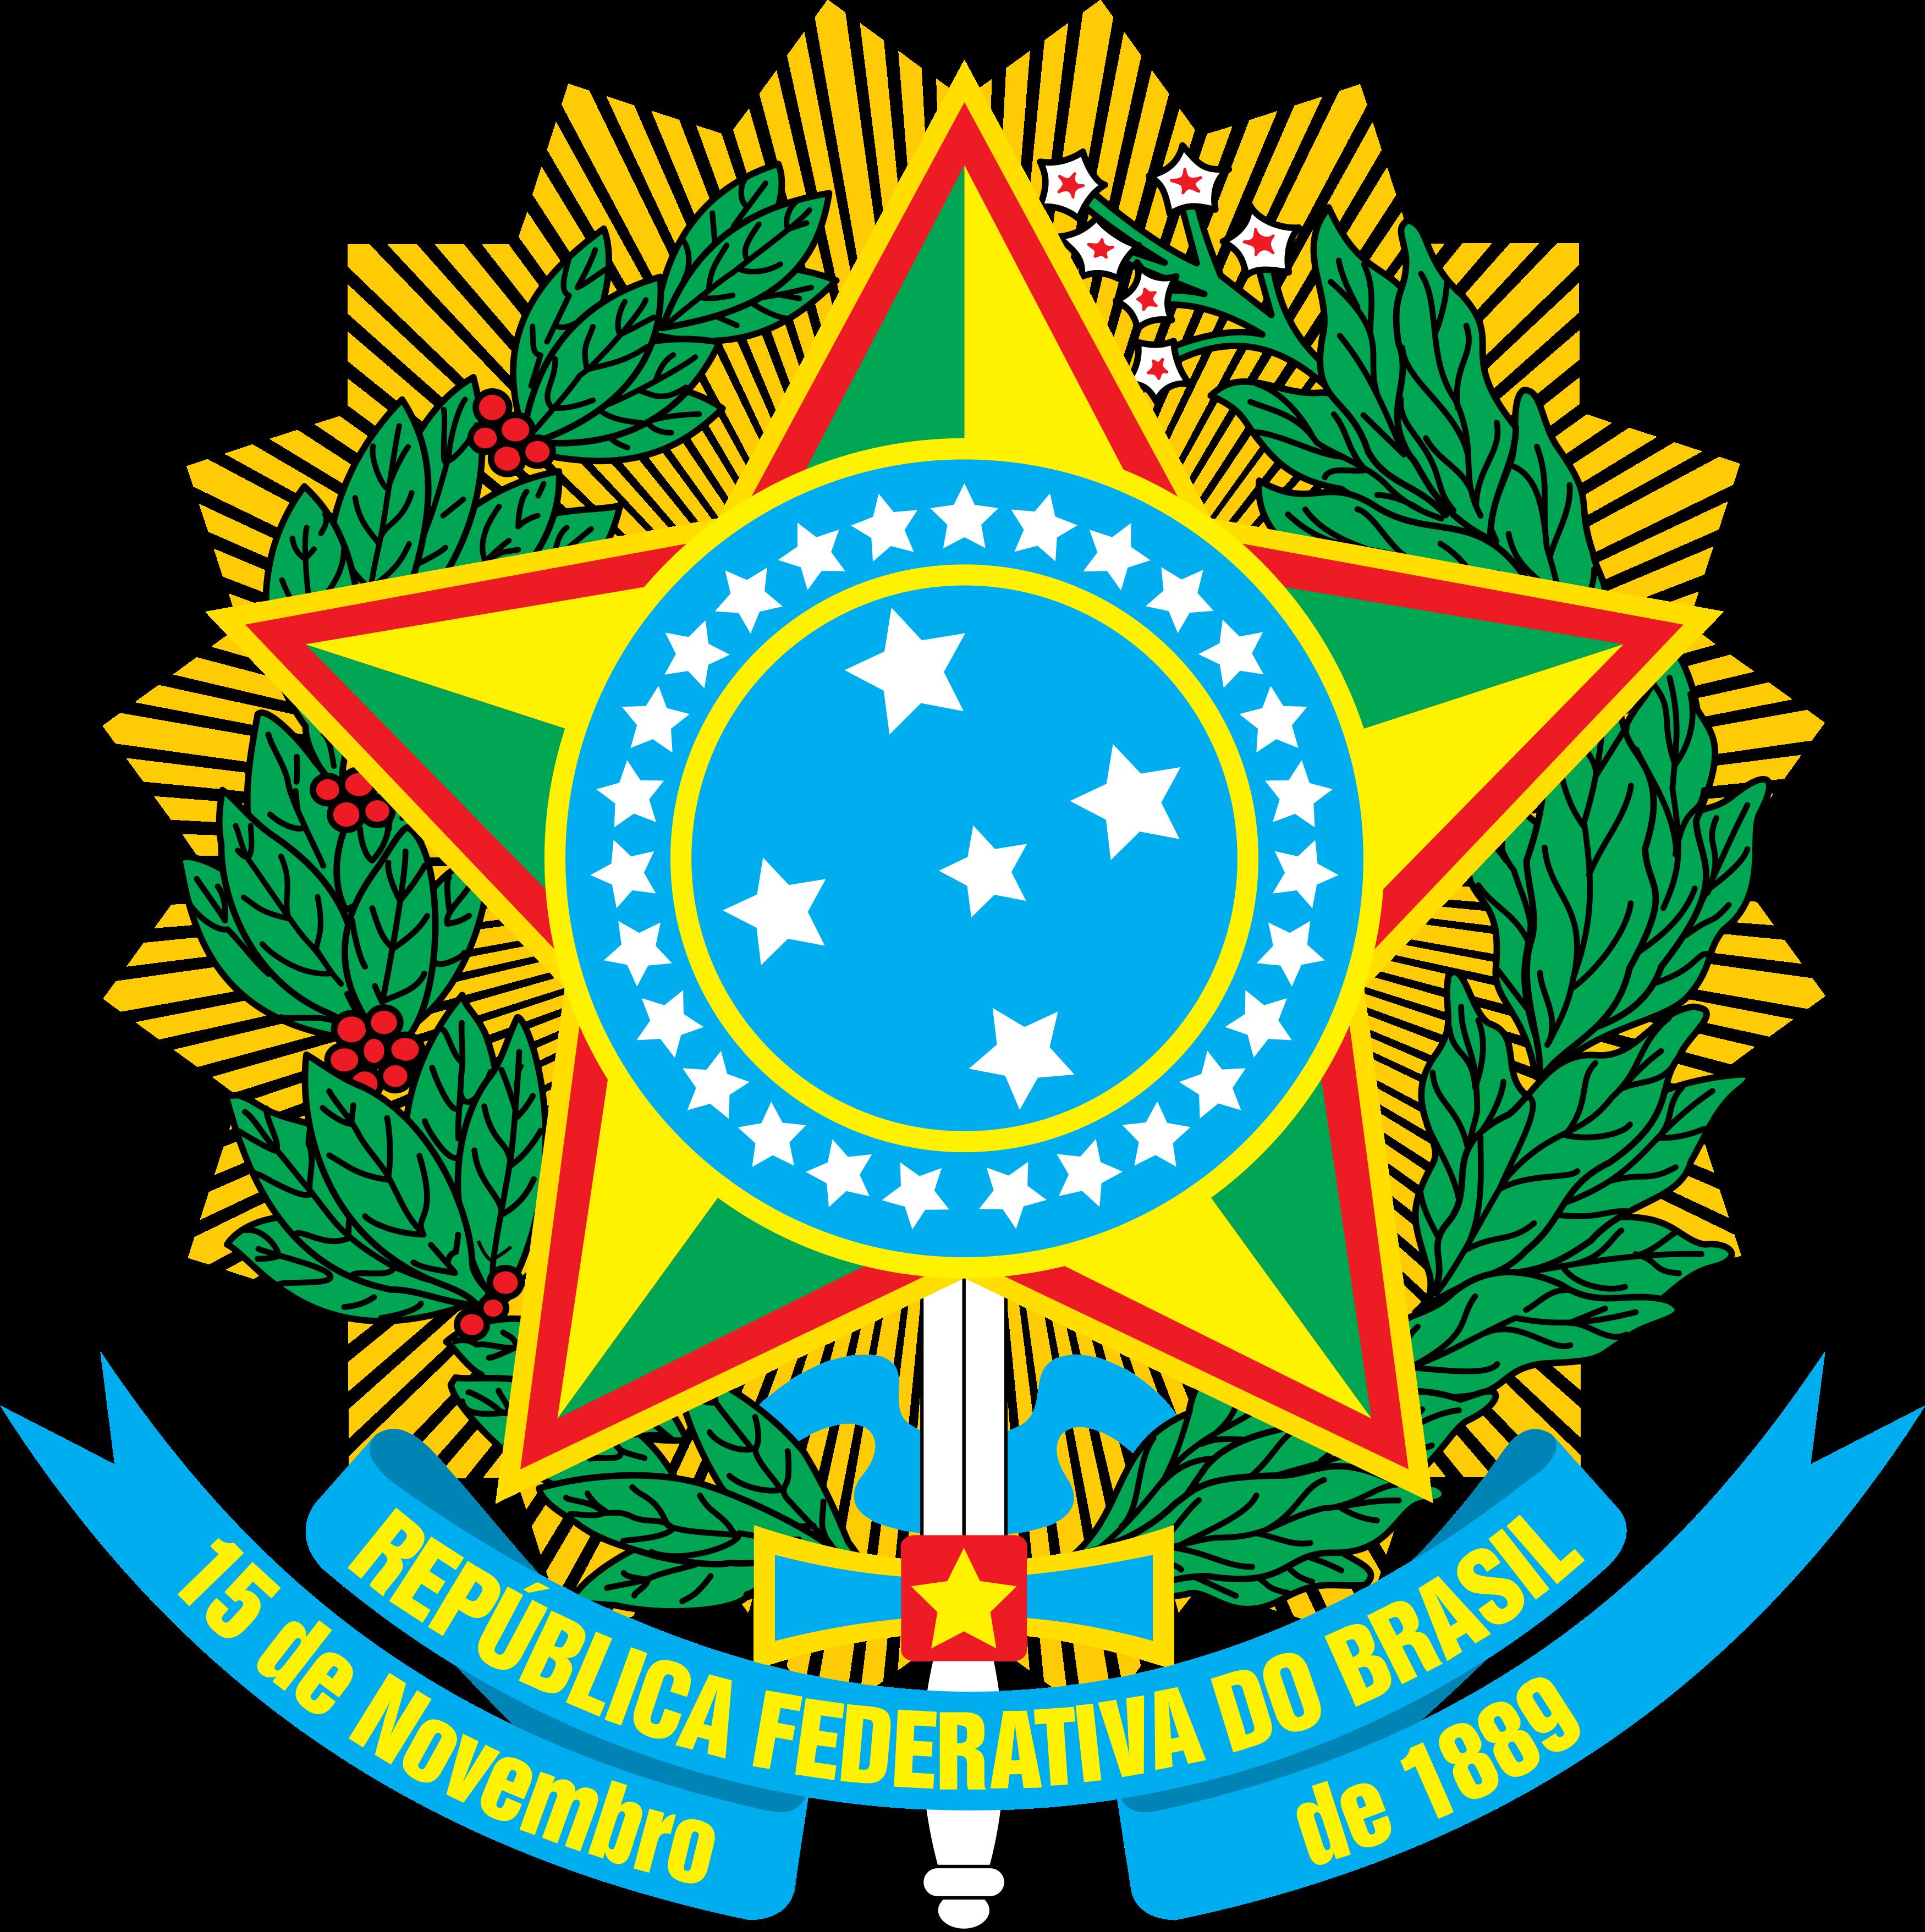 Bras U00e3o Do Brasil Baixar Em PNG No Bras U00e3o Org